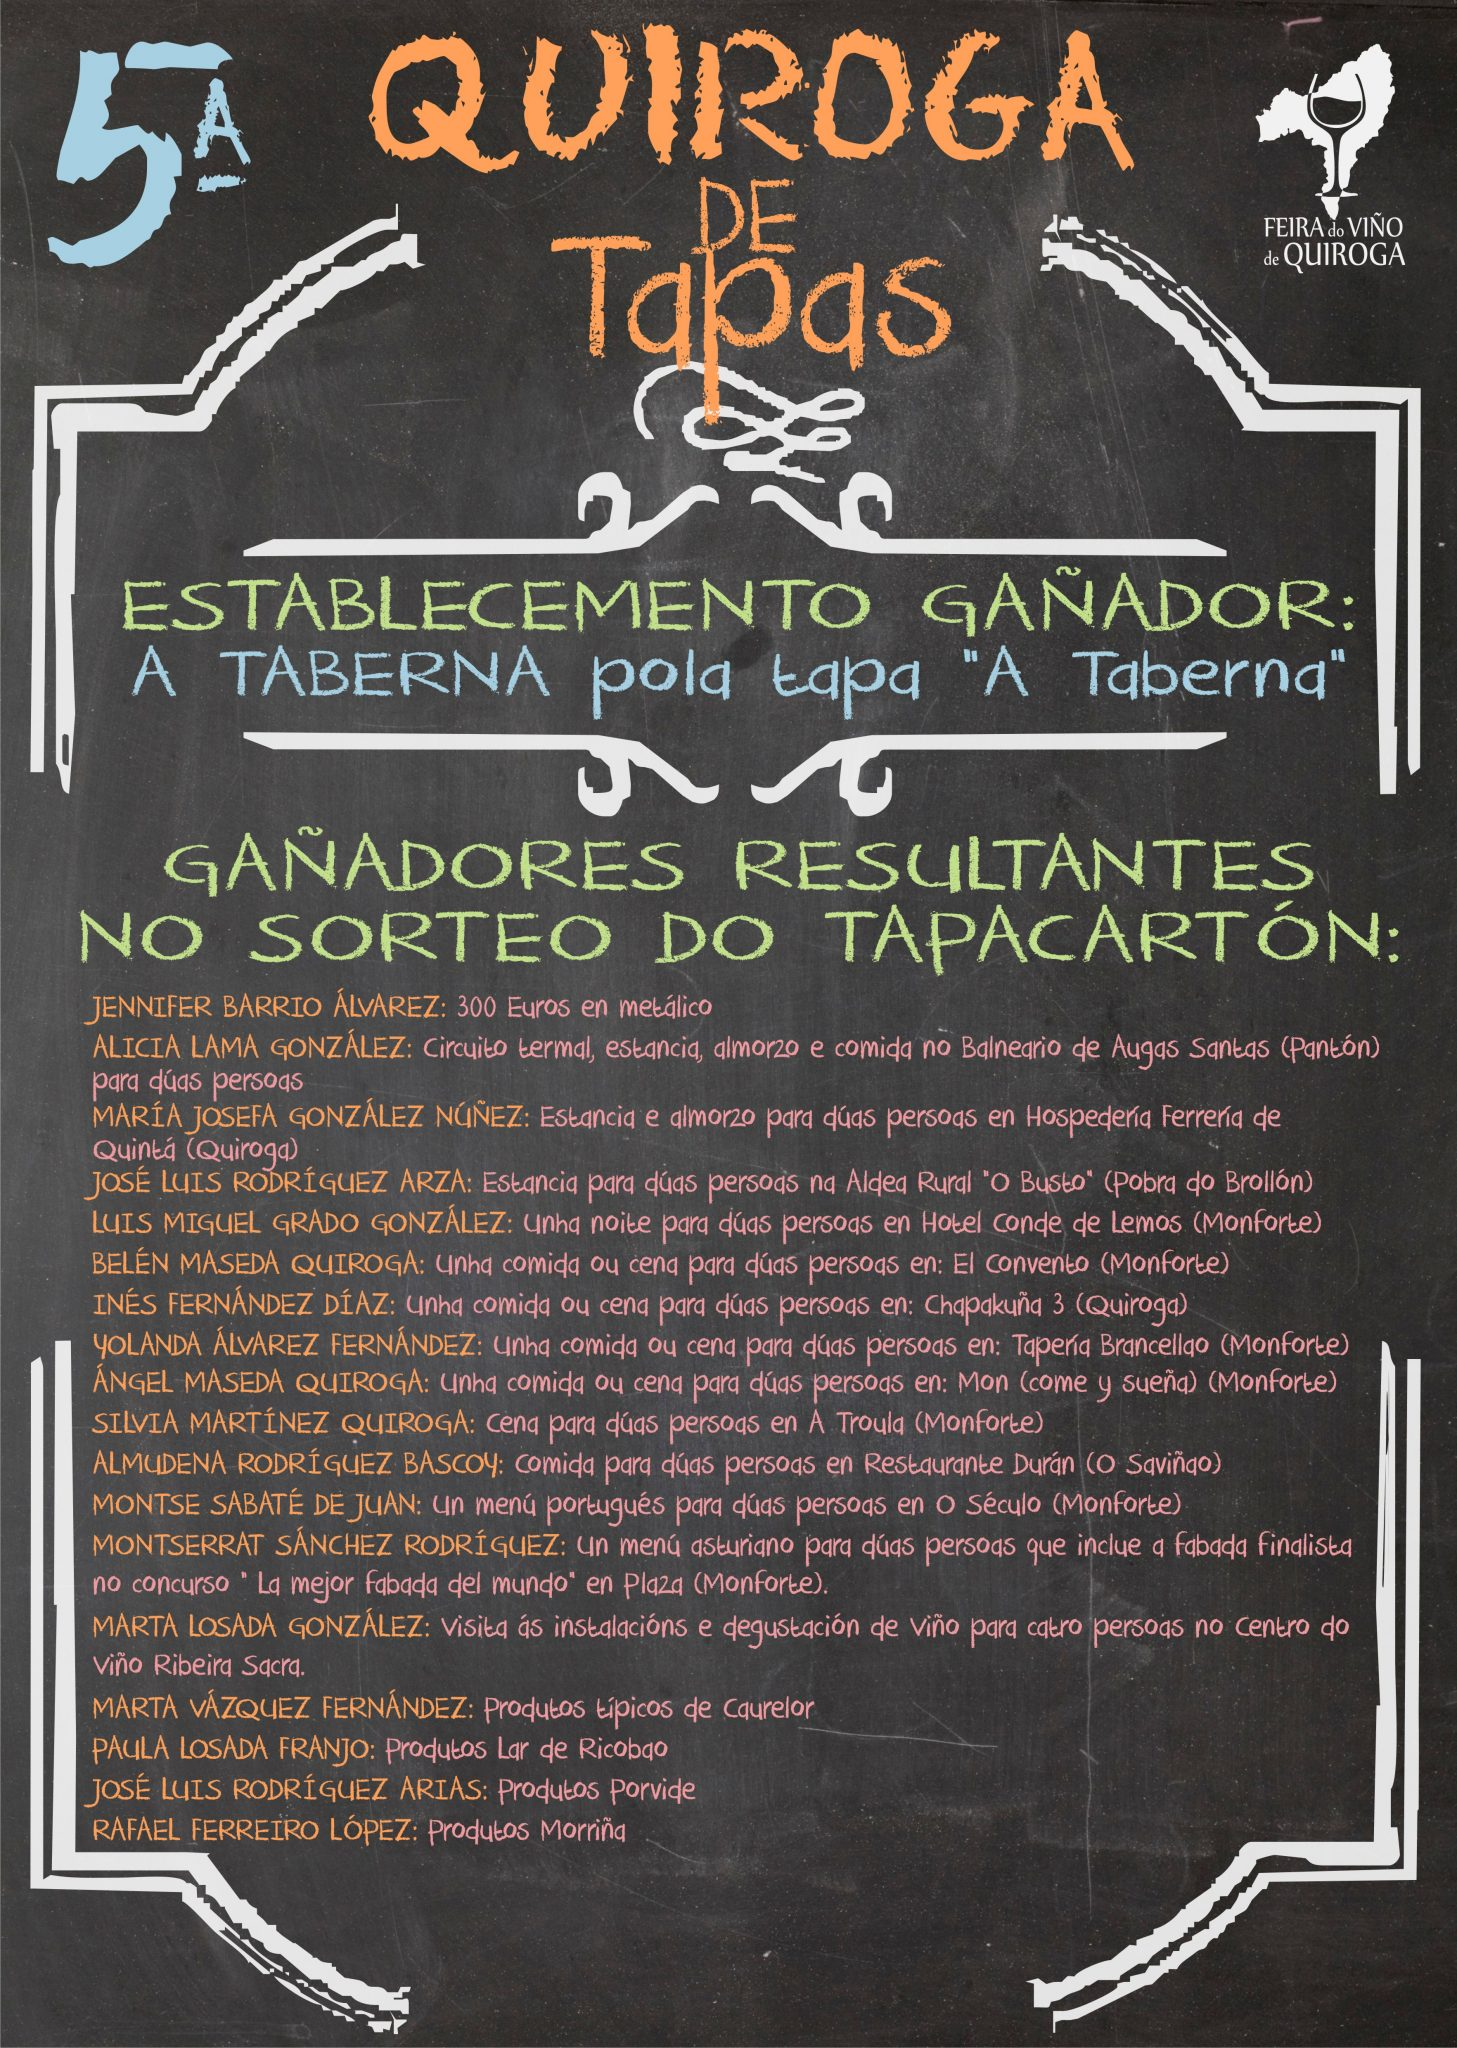 Cartel do 5º «Quiroga de Tapas»